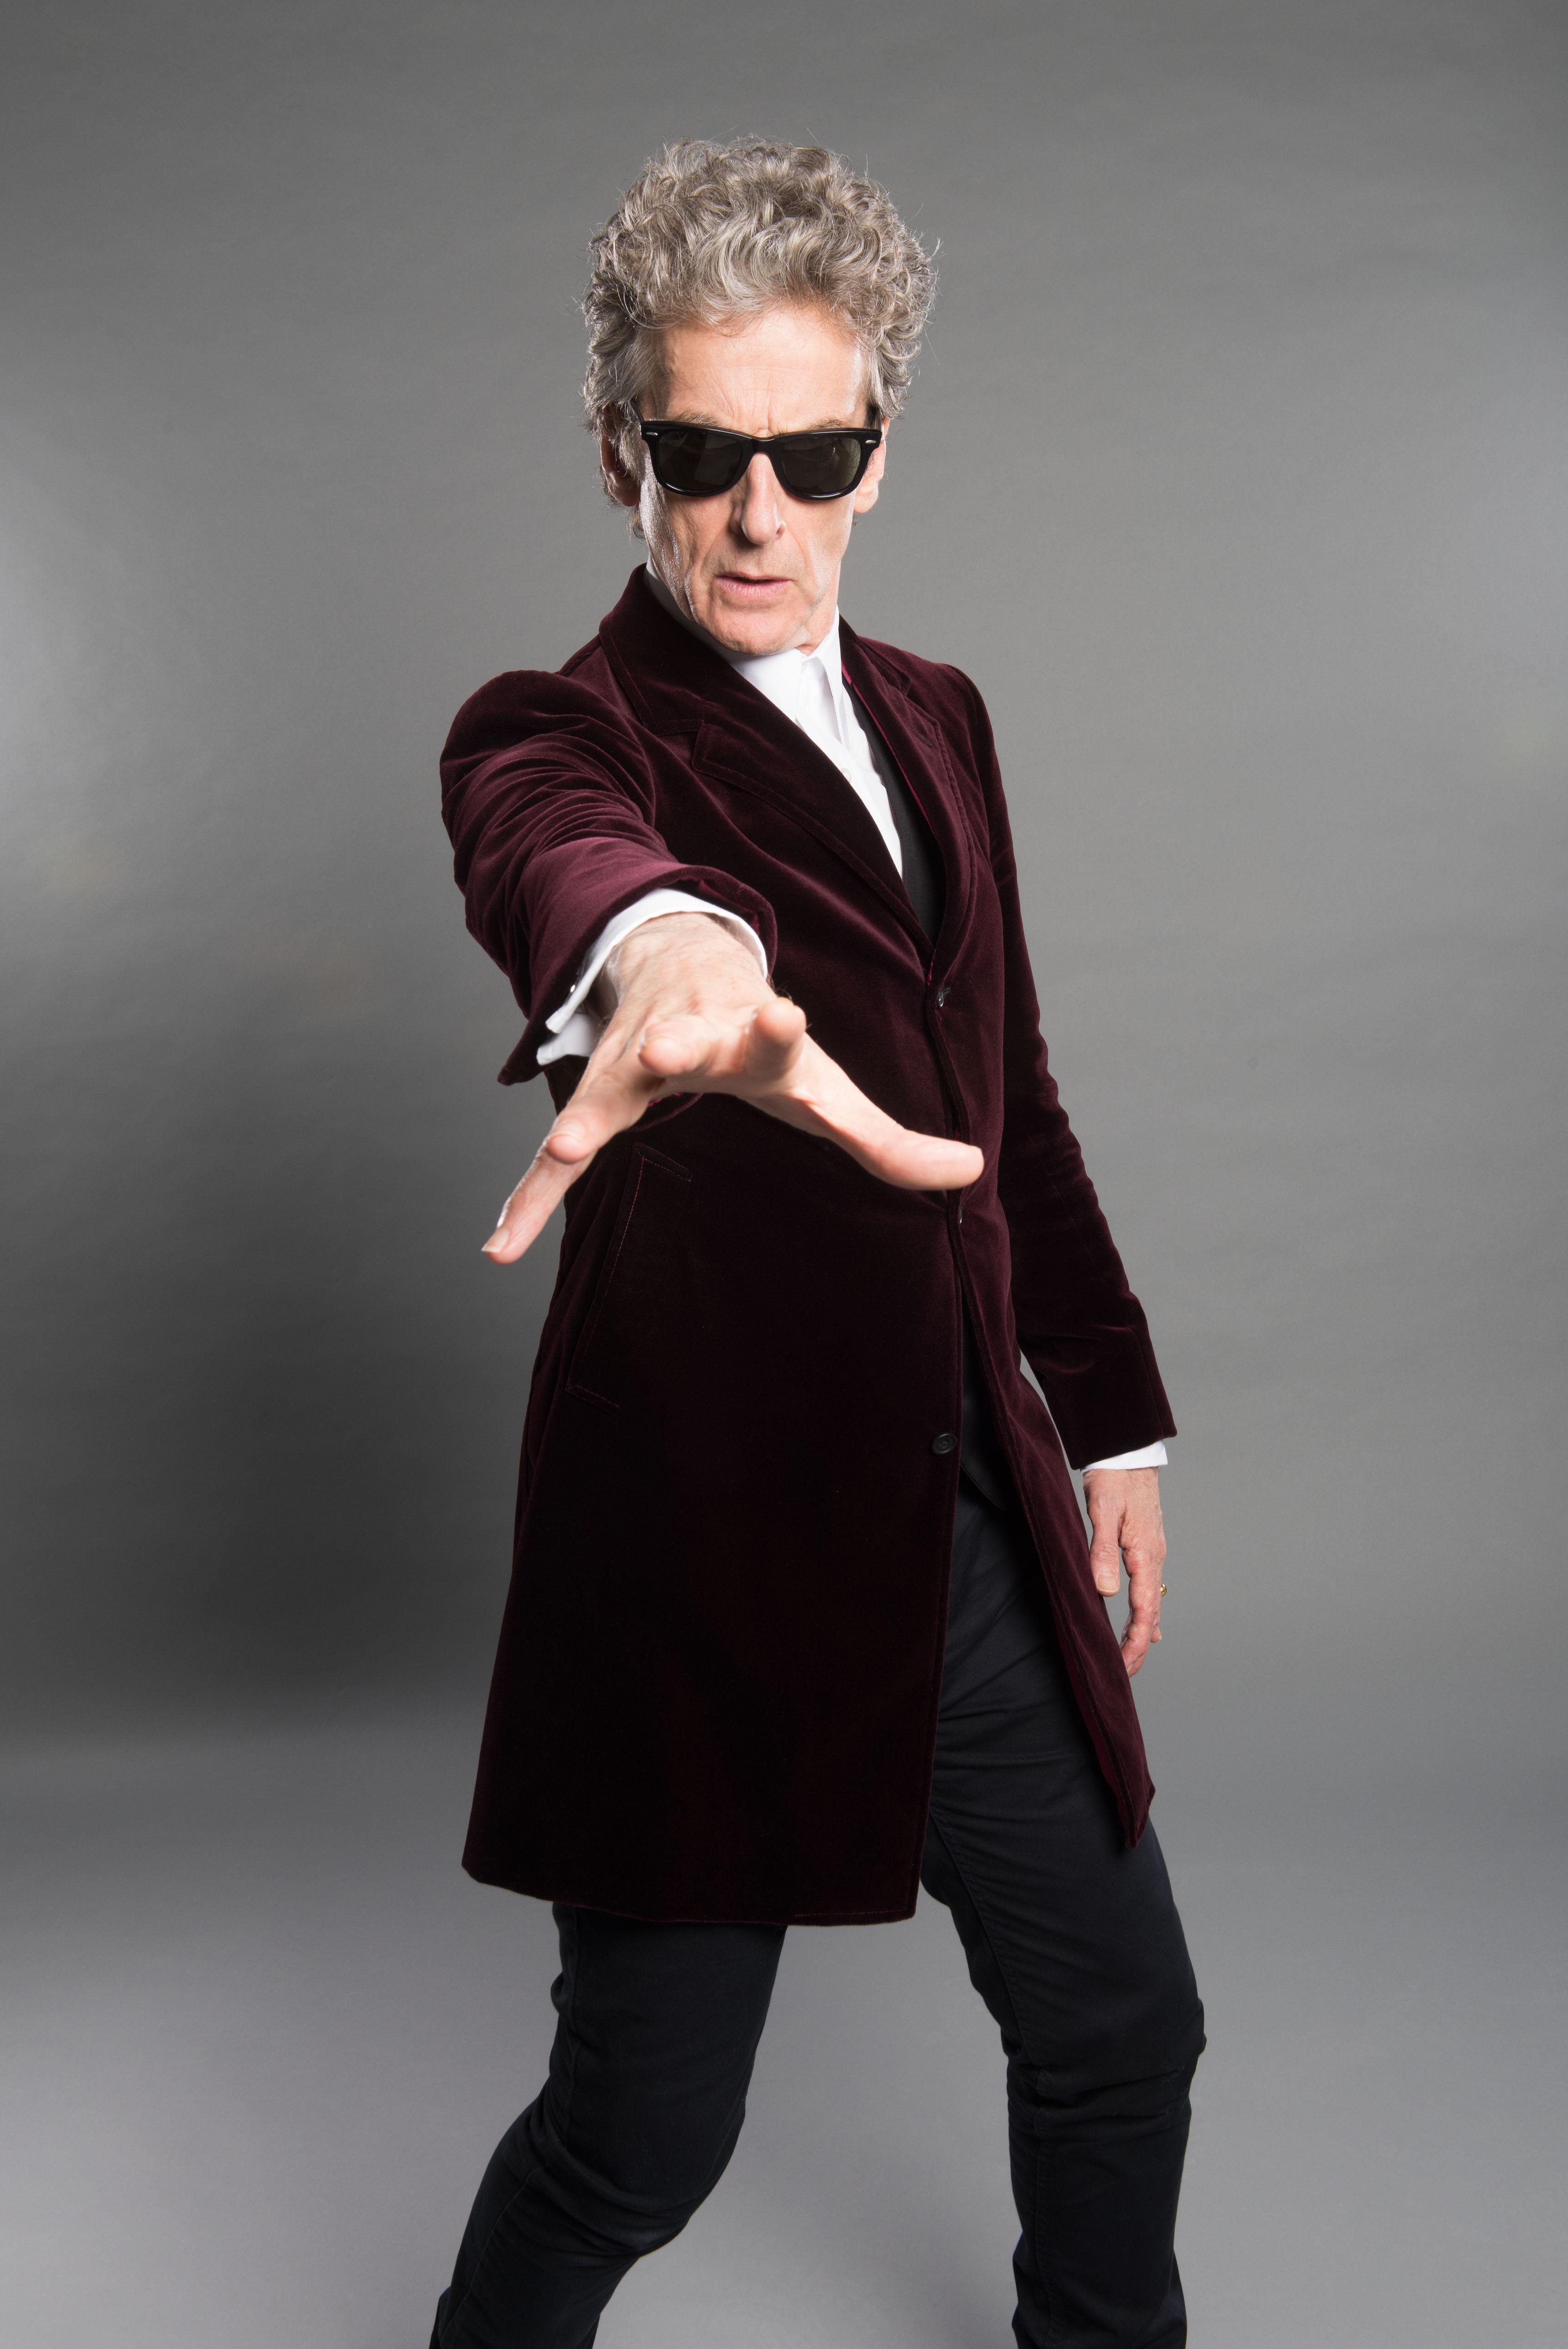 Doctor Who - Episode 10.06 - Extremis - Promo Pics